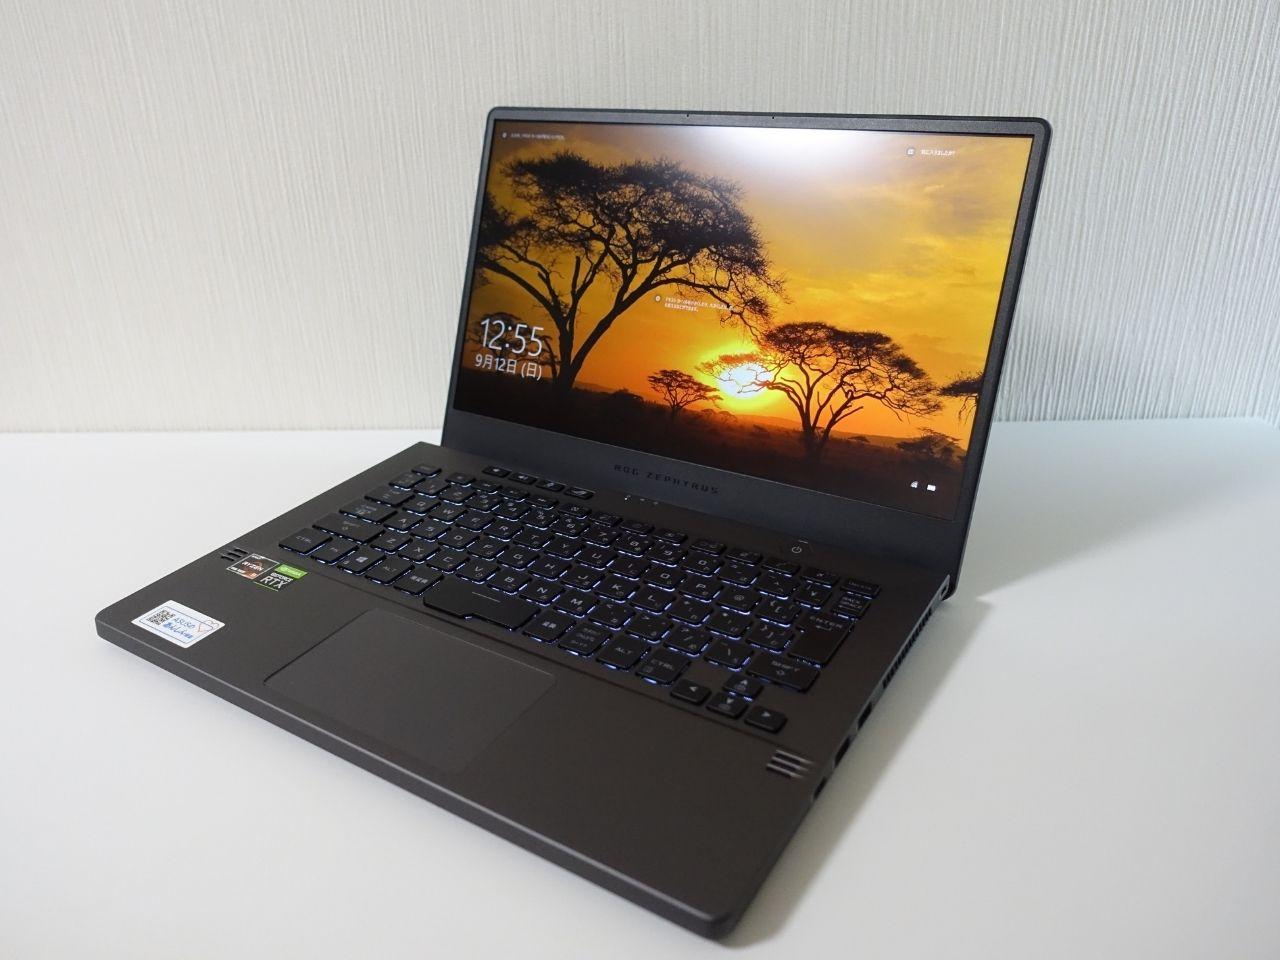 ASUS ROG ZEPHYRUS G14のレビュー。コンパクトで軽いのにパワフルなノートパソコン。